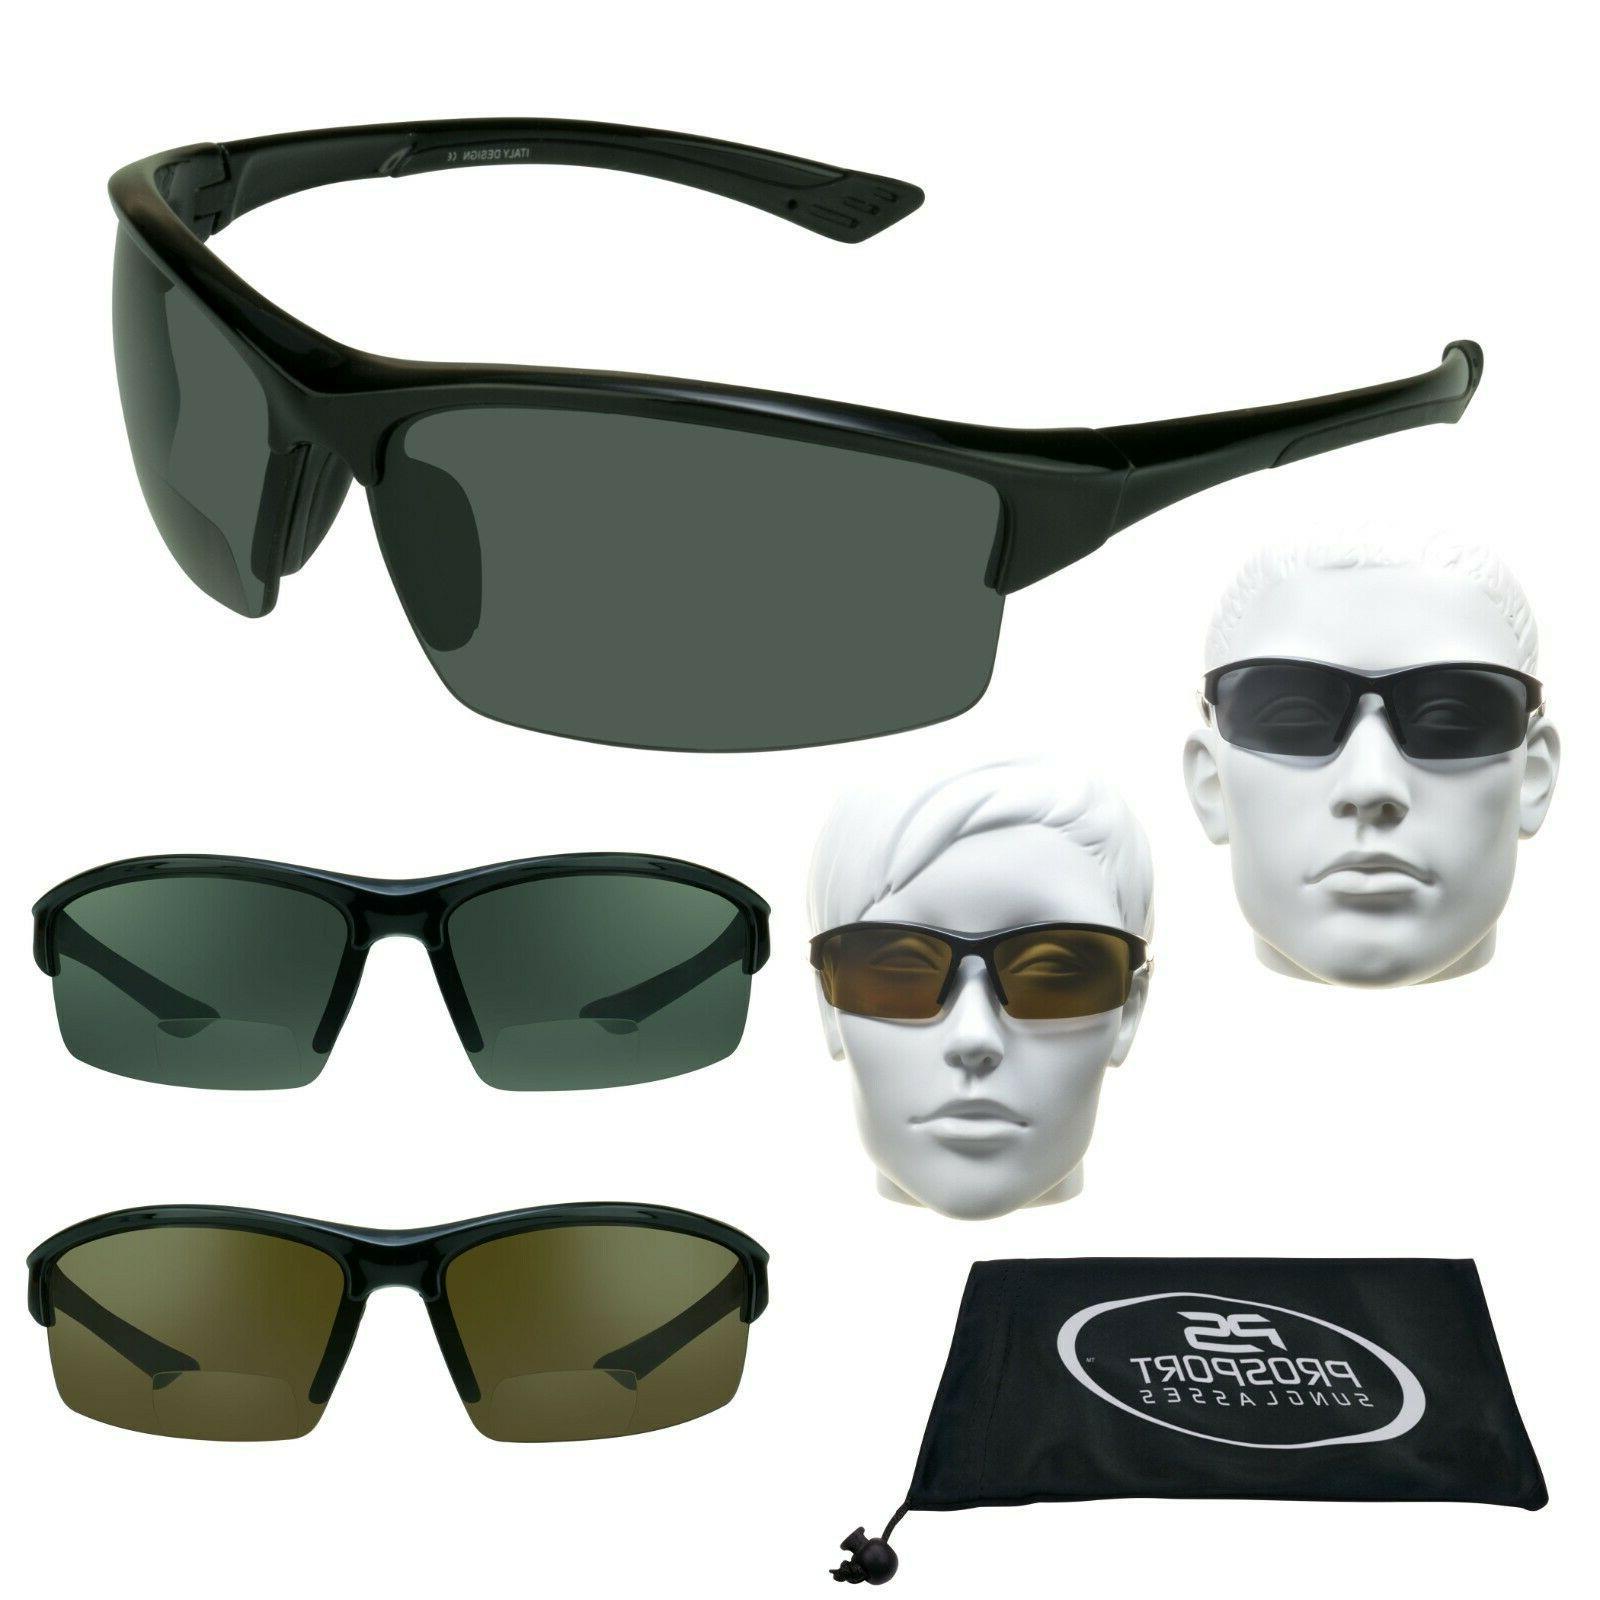 Bifocal POLARIZED Sunglasses Sun Readers Fishing Cycling Driving 1.5 2.0 2.5 3.0